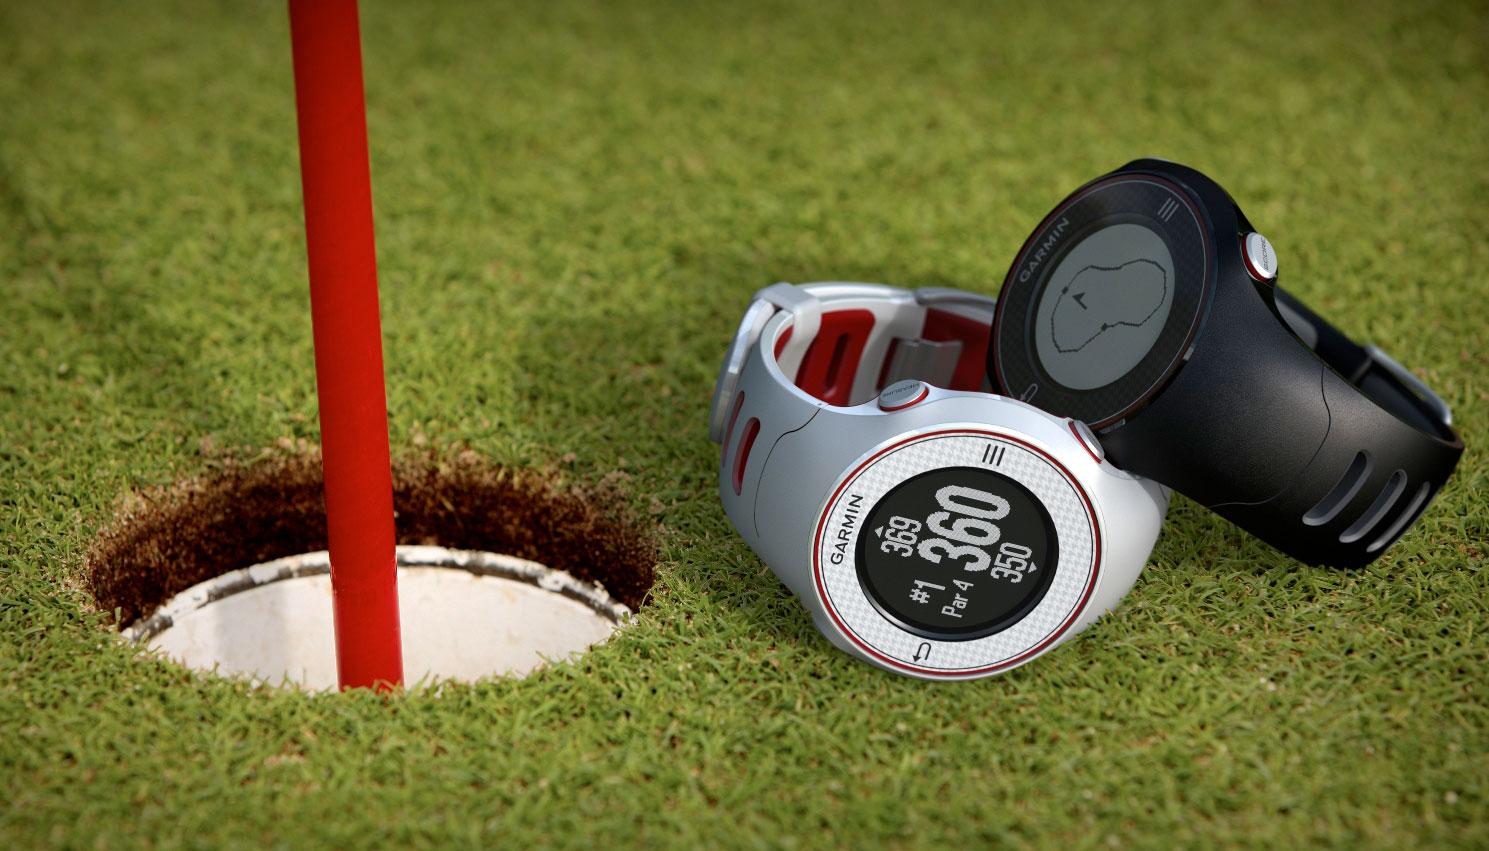 Gps Entfernungsmesser Golf Test : Test garmin approach s u gps auf dem golfplatz a pocketnavigation